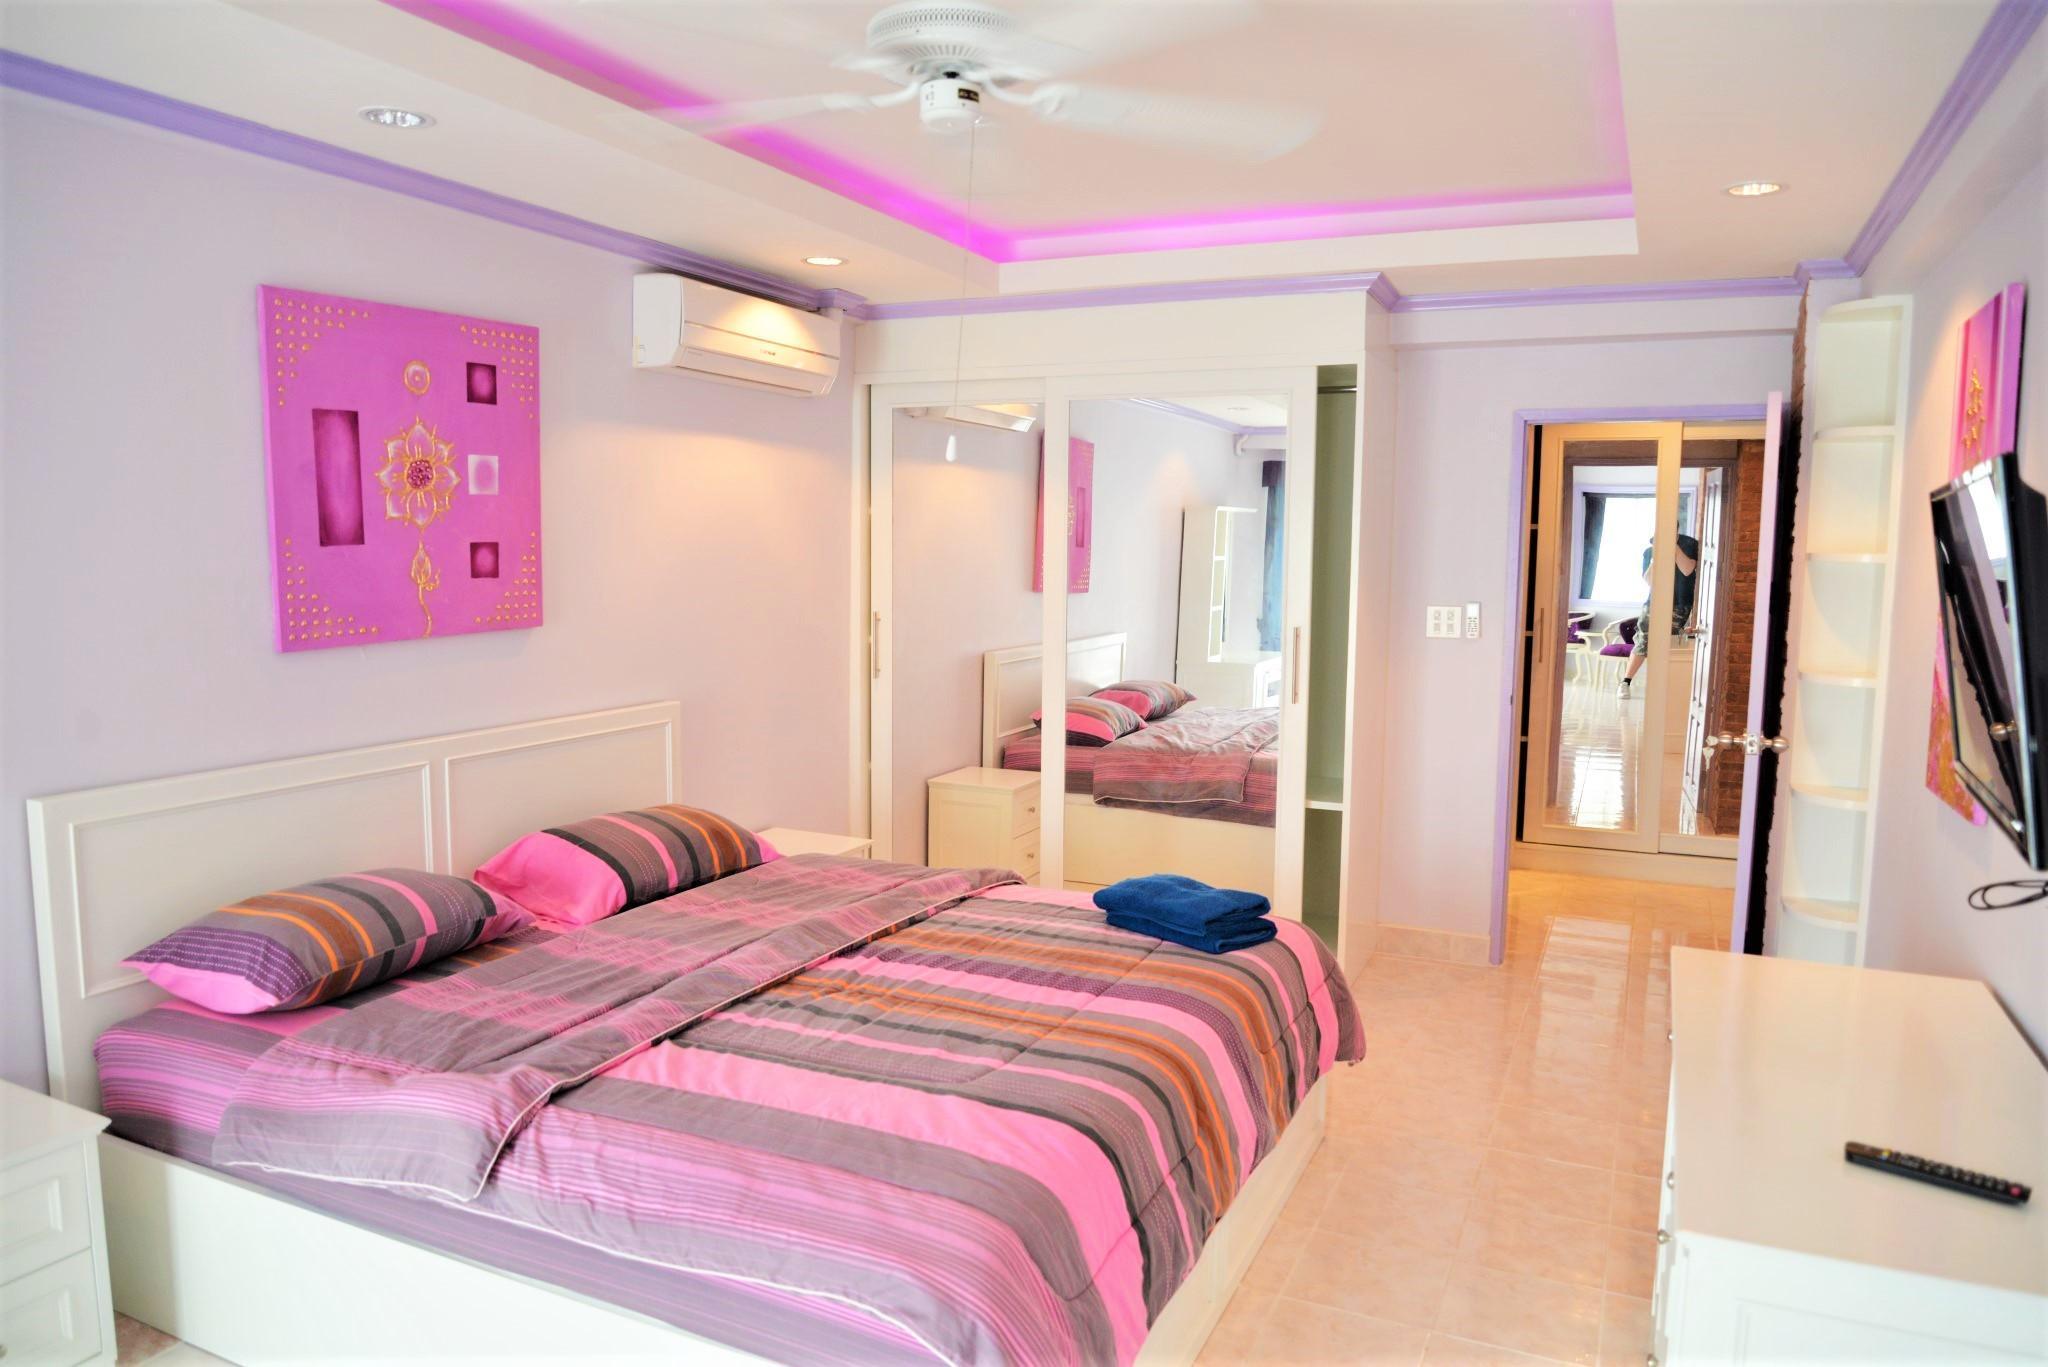 Large 1 bed with double balconies Jomtien beach S1 อพาร์ตเมนต์ 1 ห้องนอน 1 ห้องน้ำส่วนตัว ขนาด 68 ตร.ม. – หาดจอมเทียน